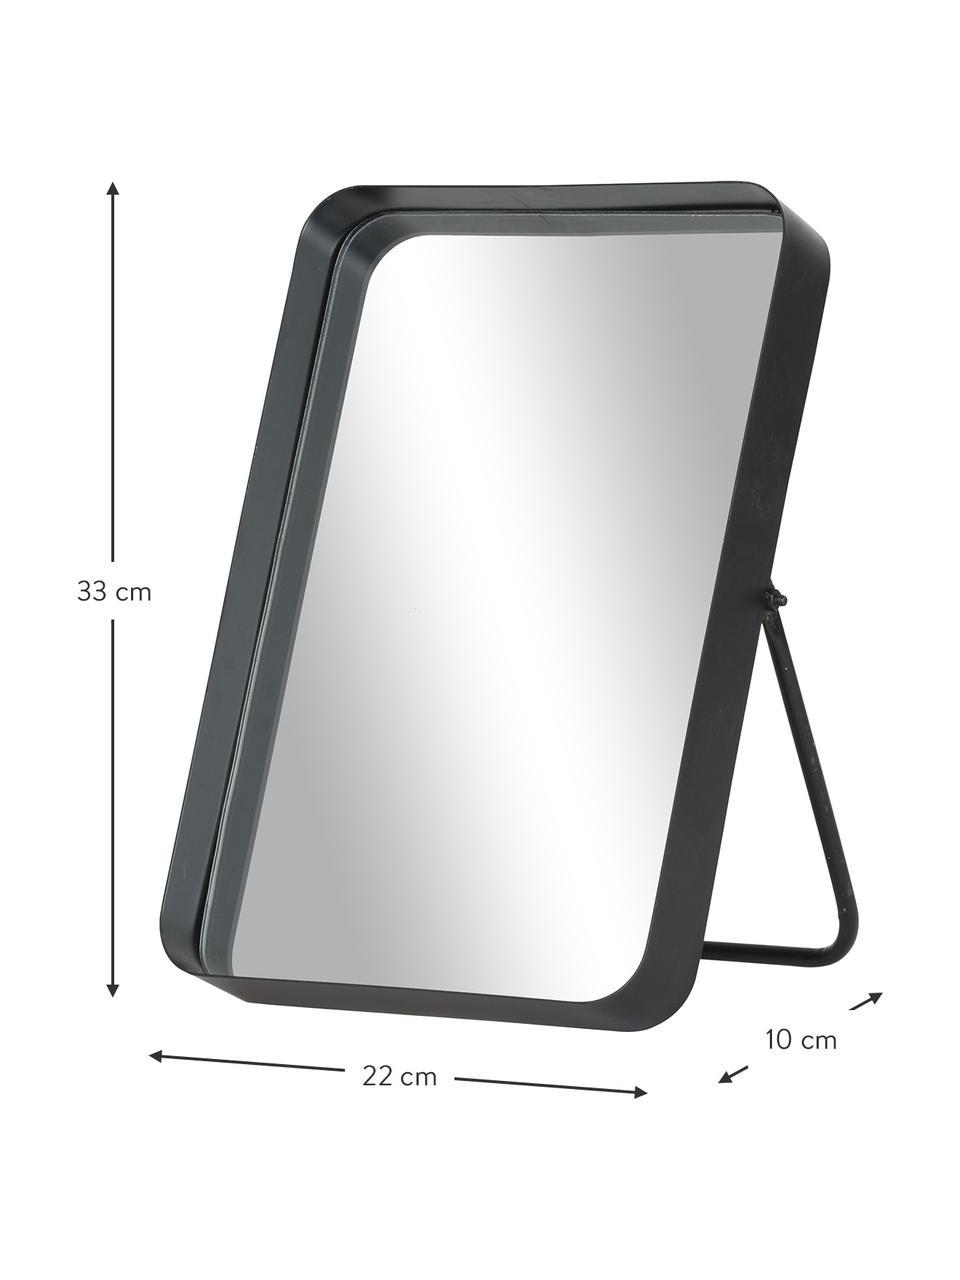 Kozmetické zrkadlo Bordspejl, Čierna